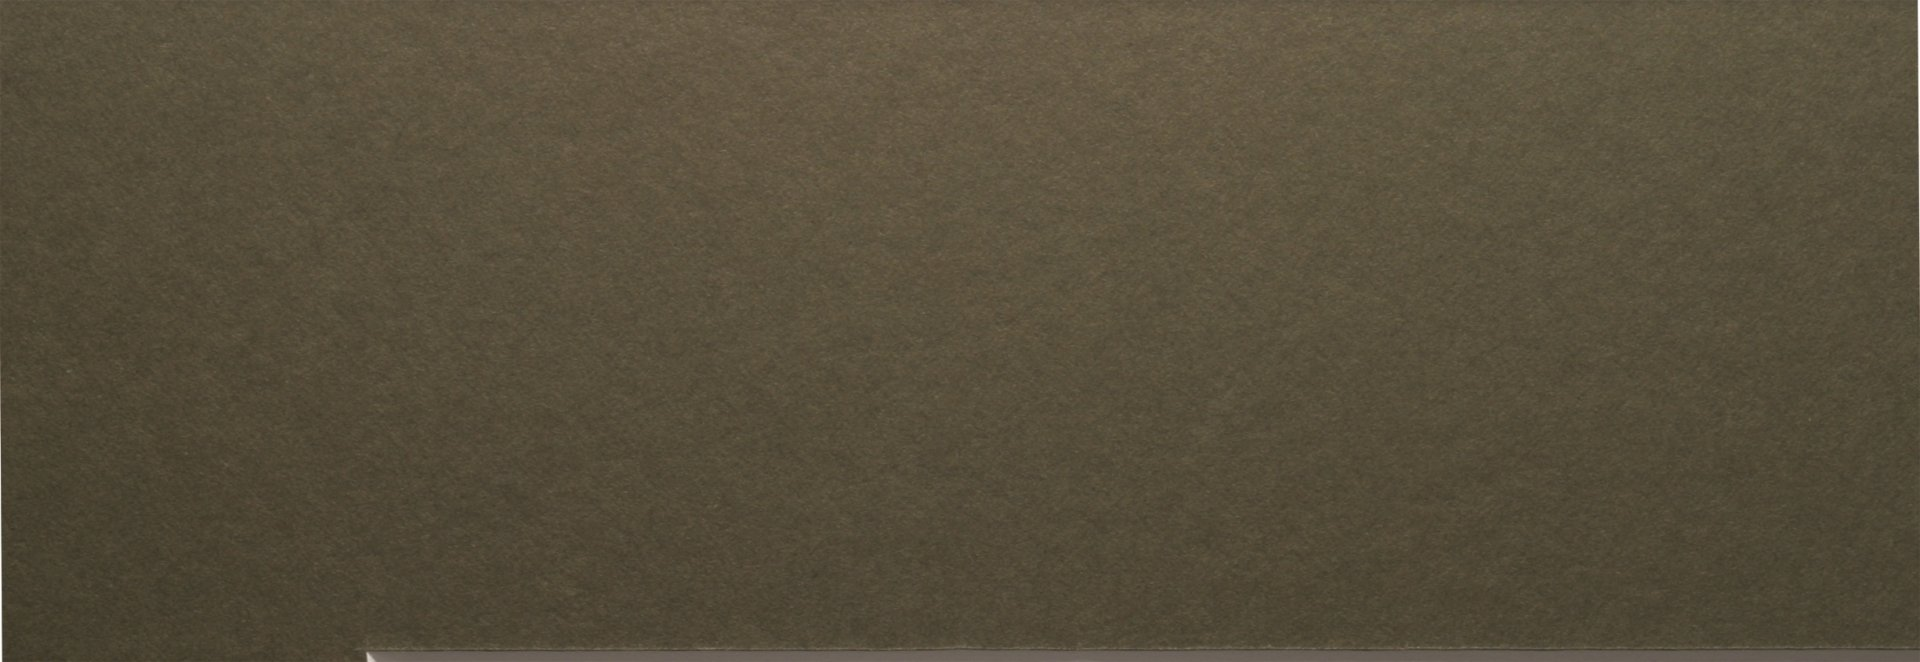 61032 Dark Olive